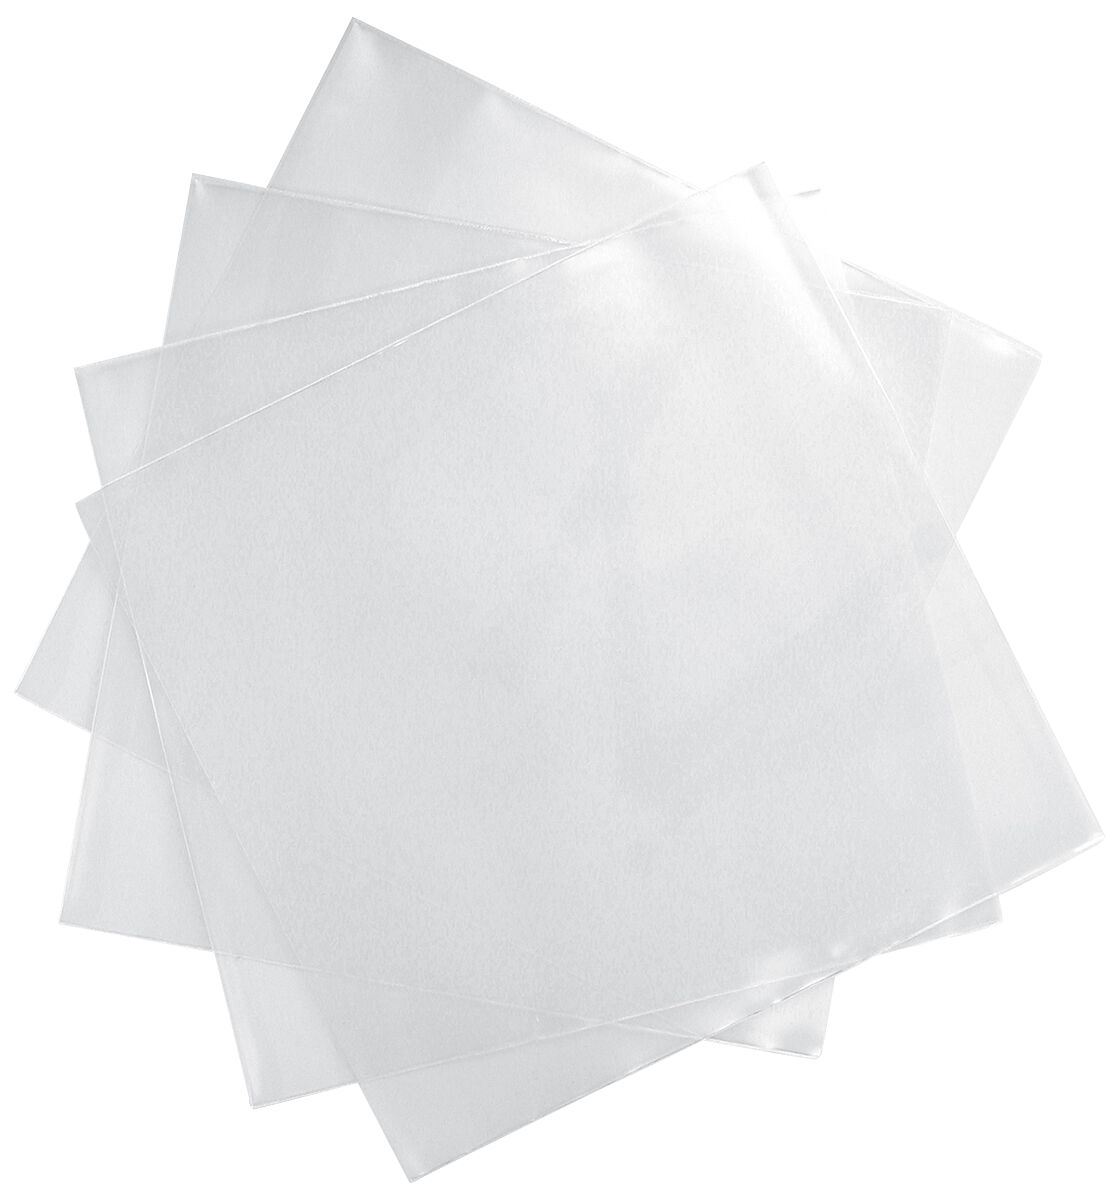 Vinyl-Schutzhüllen (100 Stück) für Singles  Schutzhülle  Standard